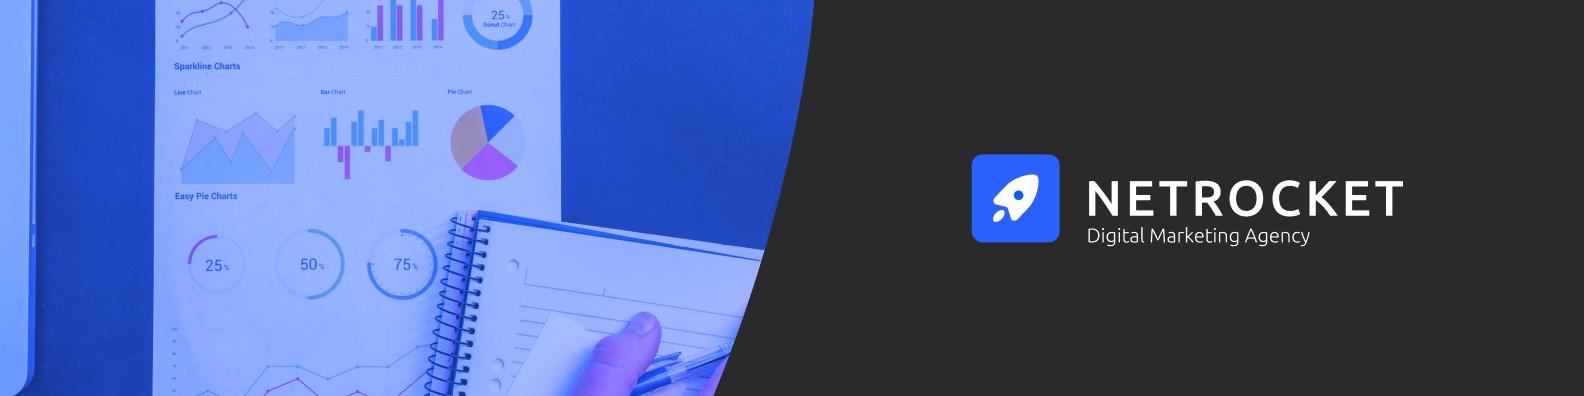 Internet marketing agency Netrocket | LinkedIn